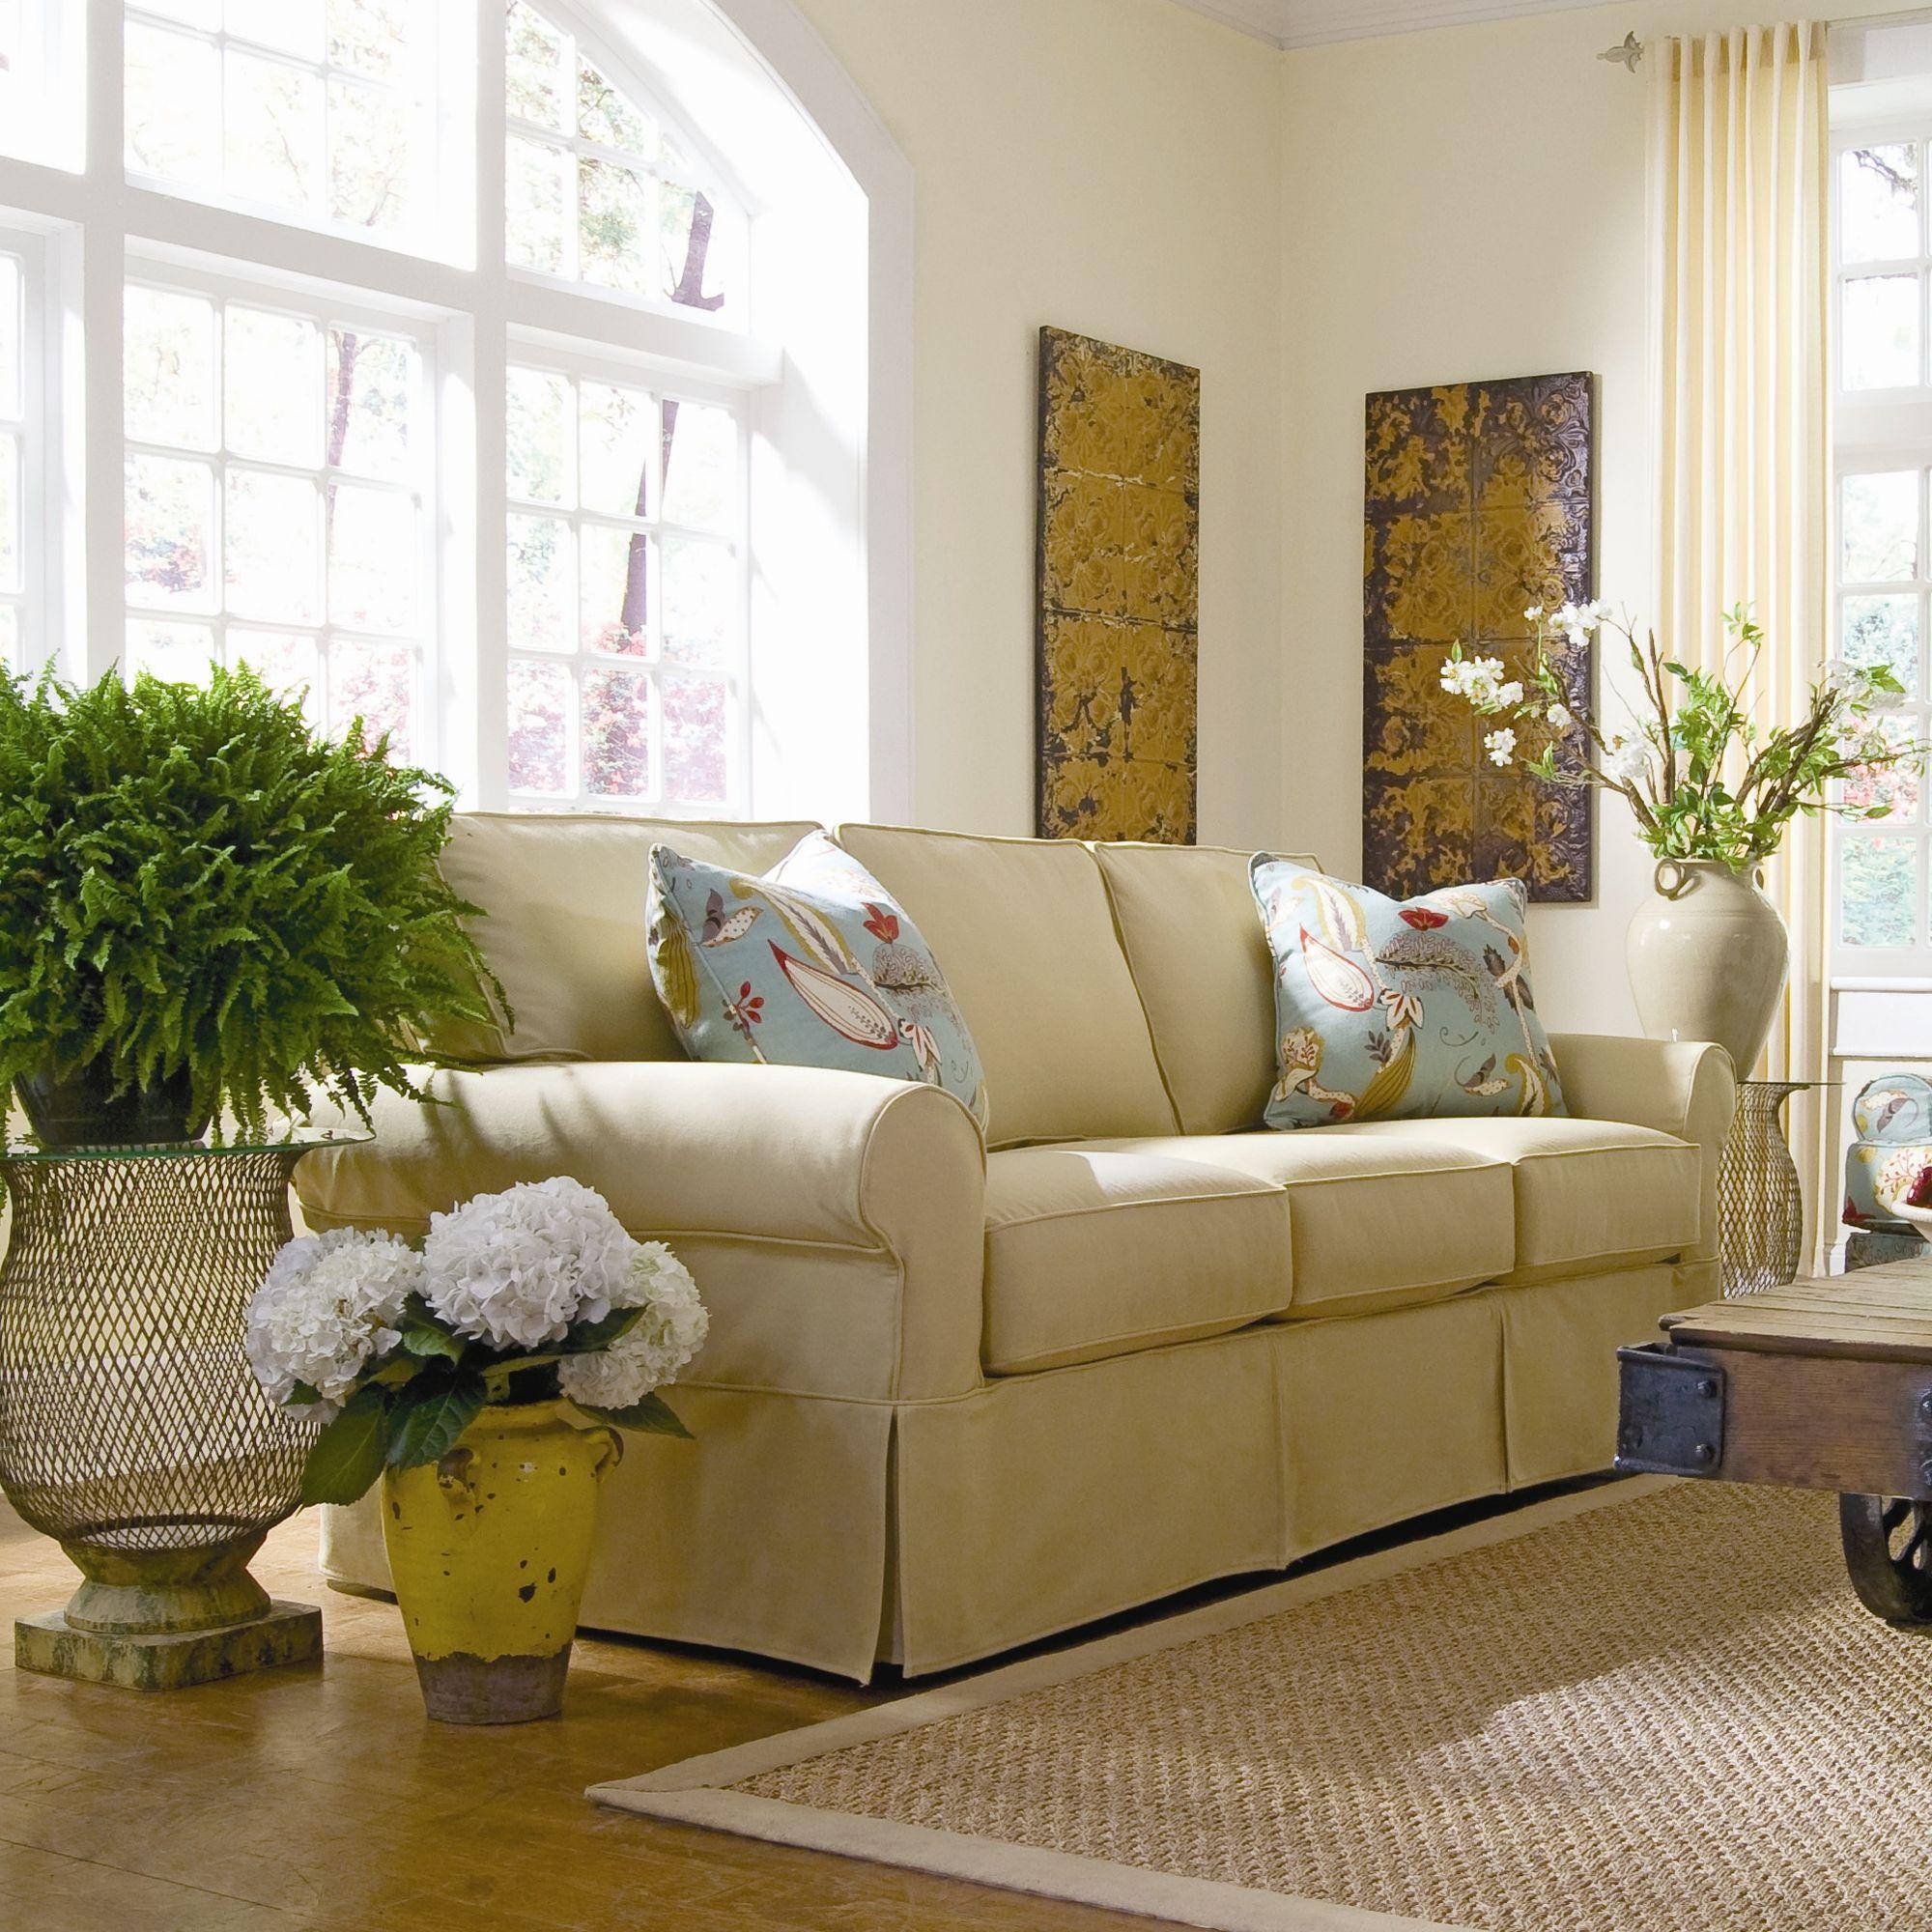 Rowe Furniture Nantucket Slipcover Sofa L84 X D40 H36 Seat Height 21